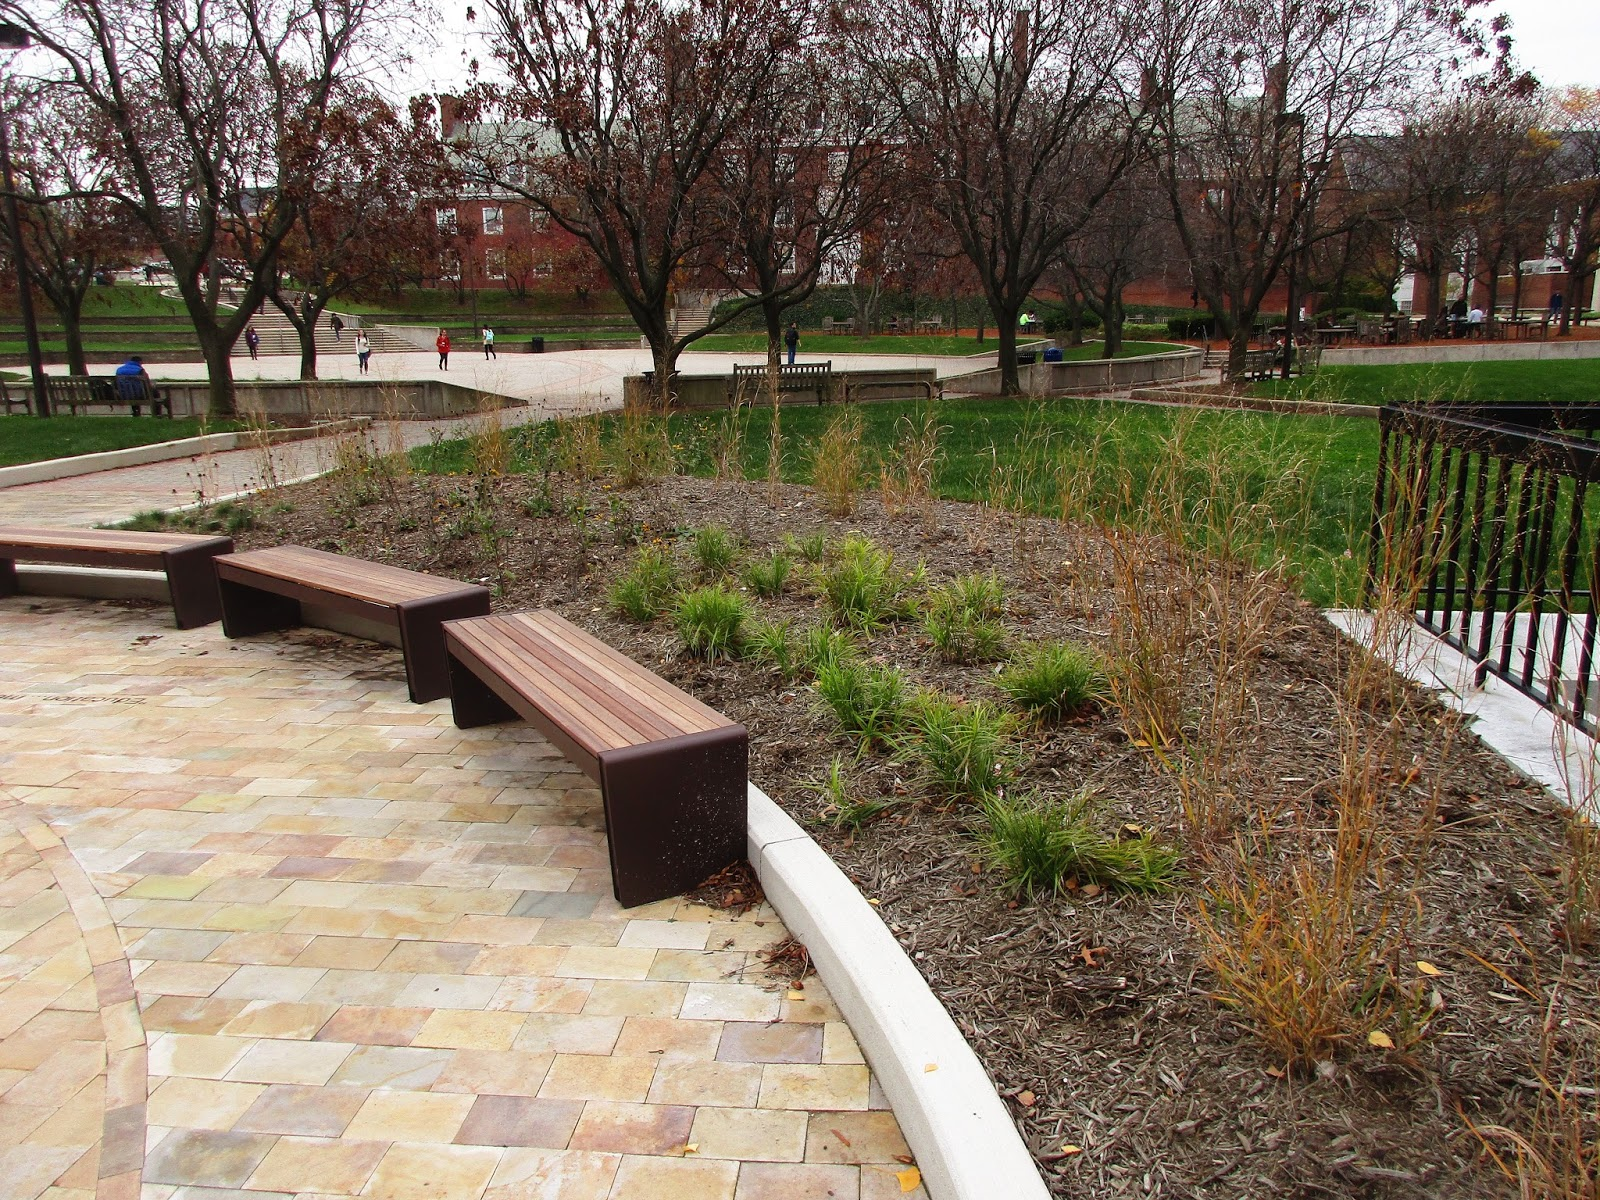 UMD Arboretum and Botanical Garden 马里兰大学植物园: The Frederick ...